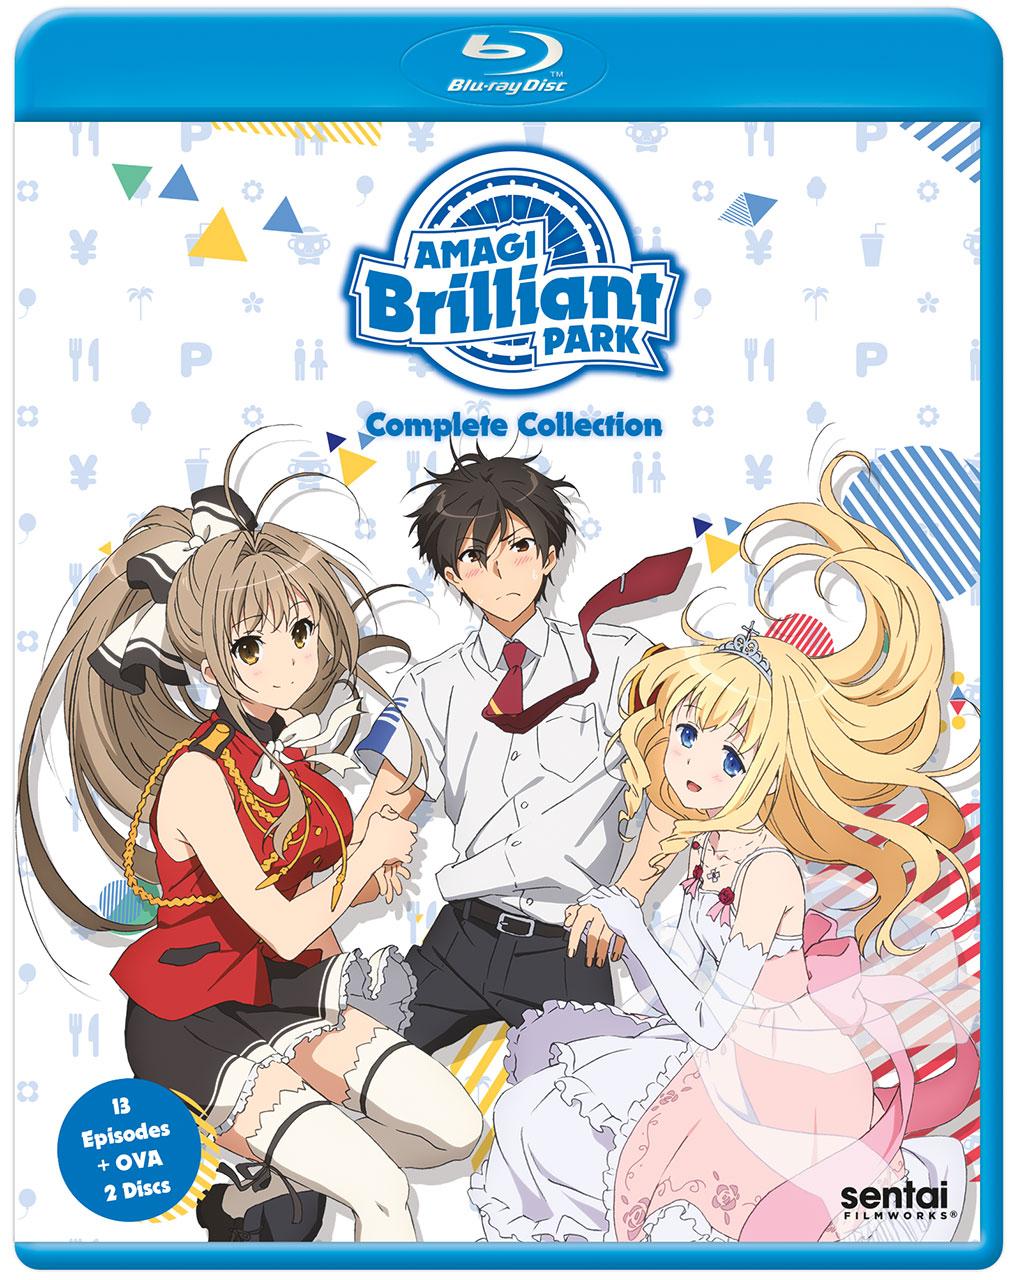 Amagi Brilliant Park Blu-ray